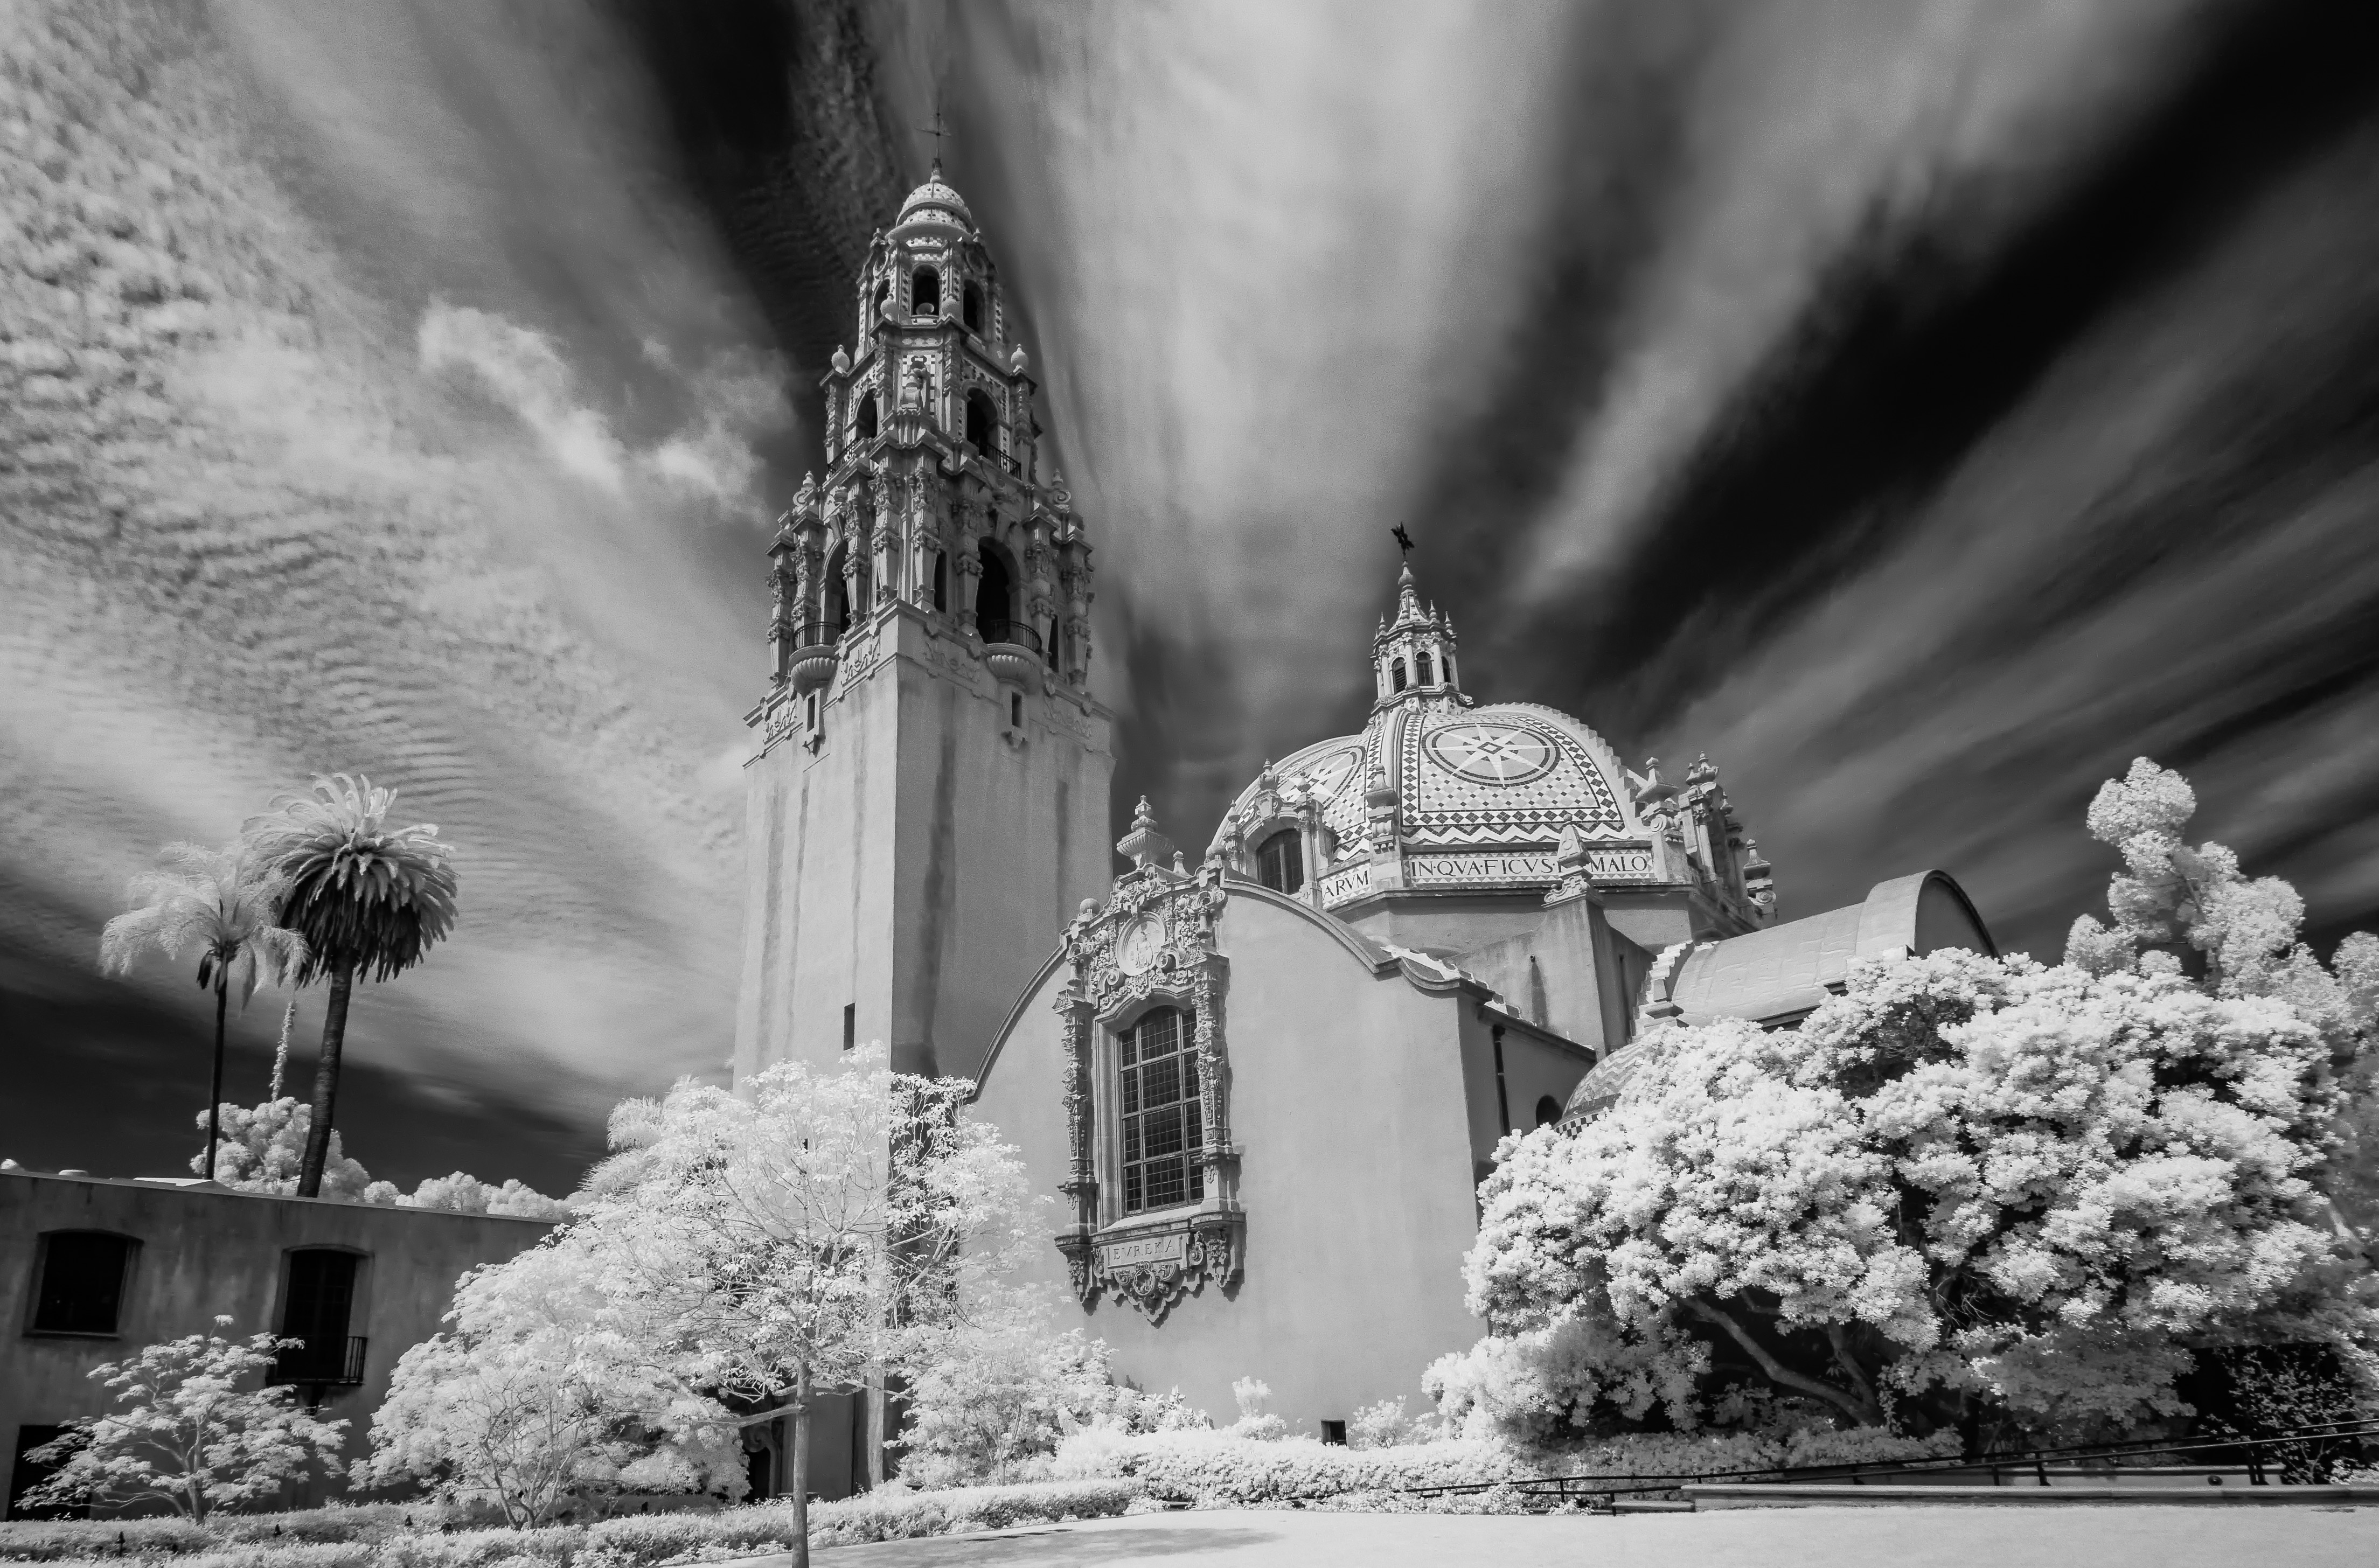 Balboa Park, San Diego infrared